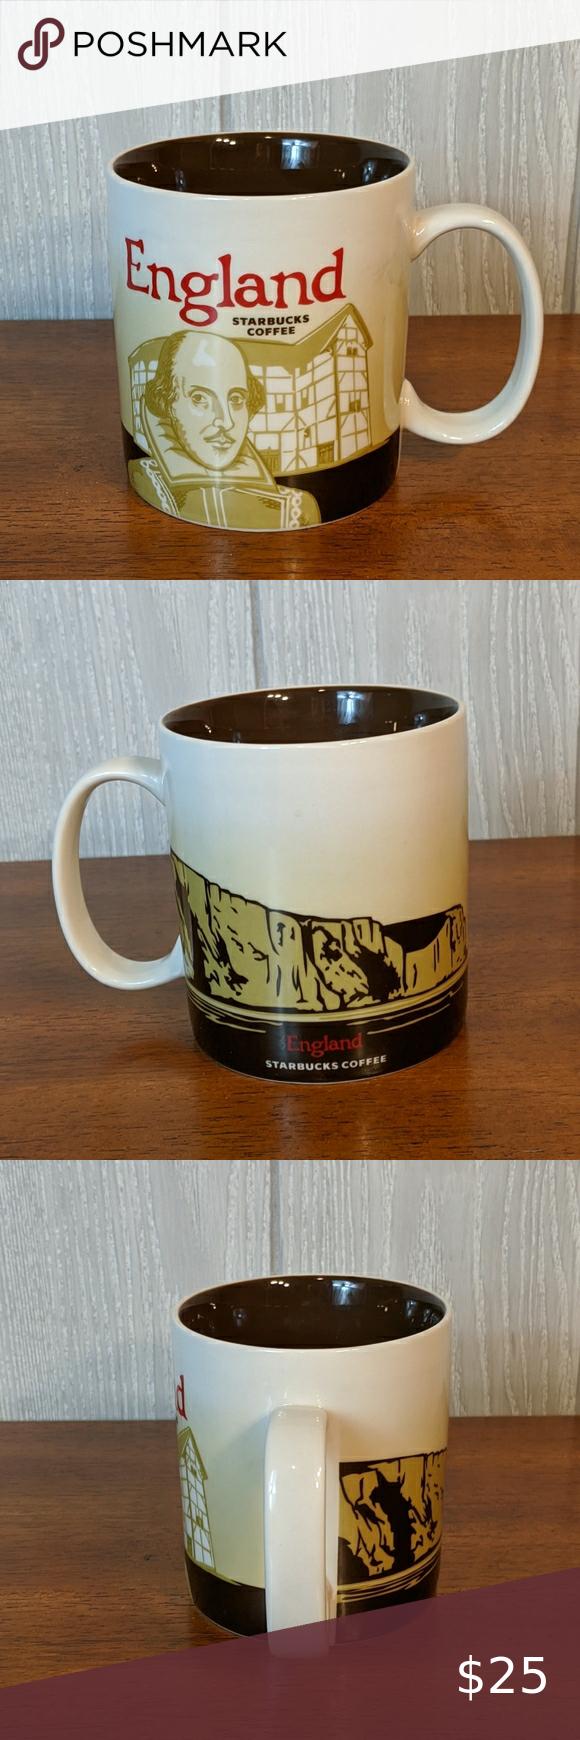 Starbucks 16oz England 2012 coffee mug Nwt in 2020